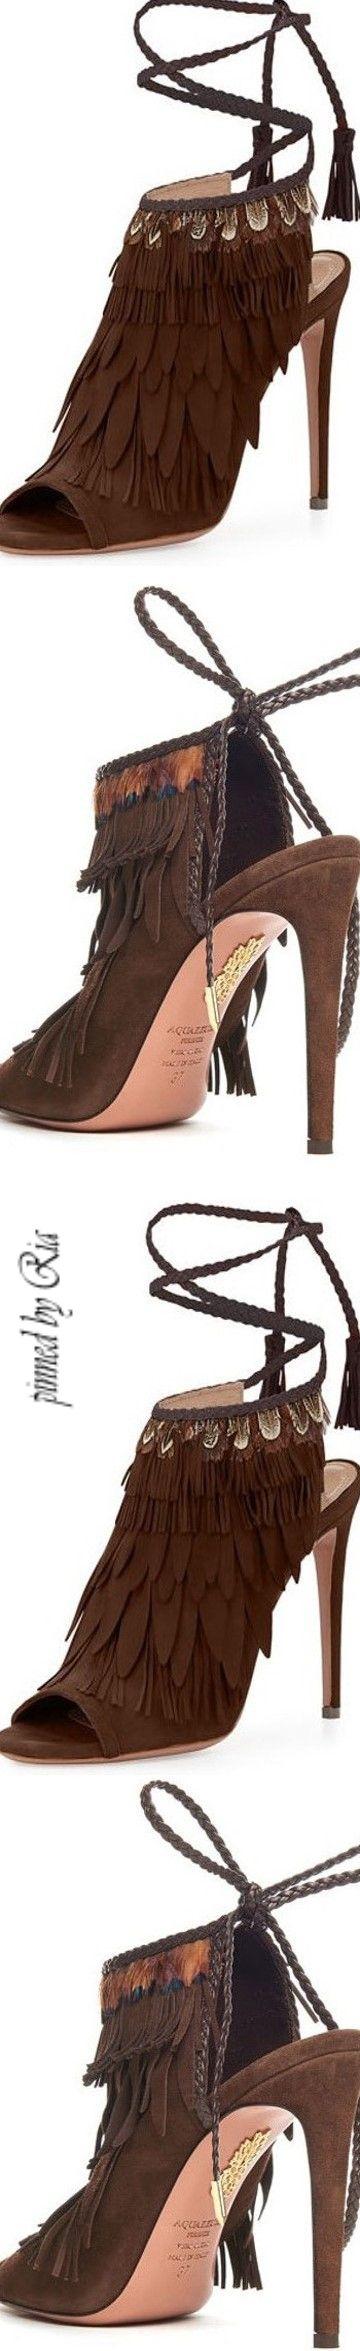 Diamond Cowgirl - Aquazzura Fringed Suede Ankle Tie Sandal l Ria